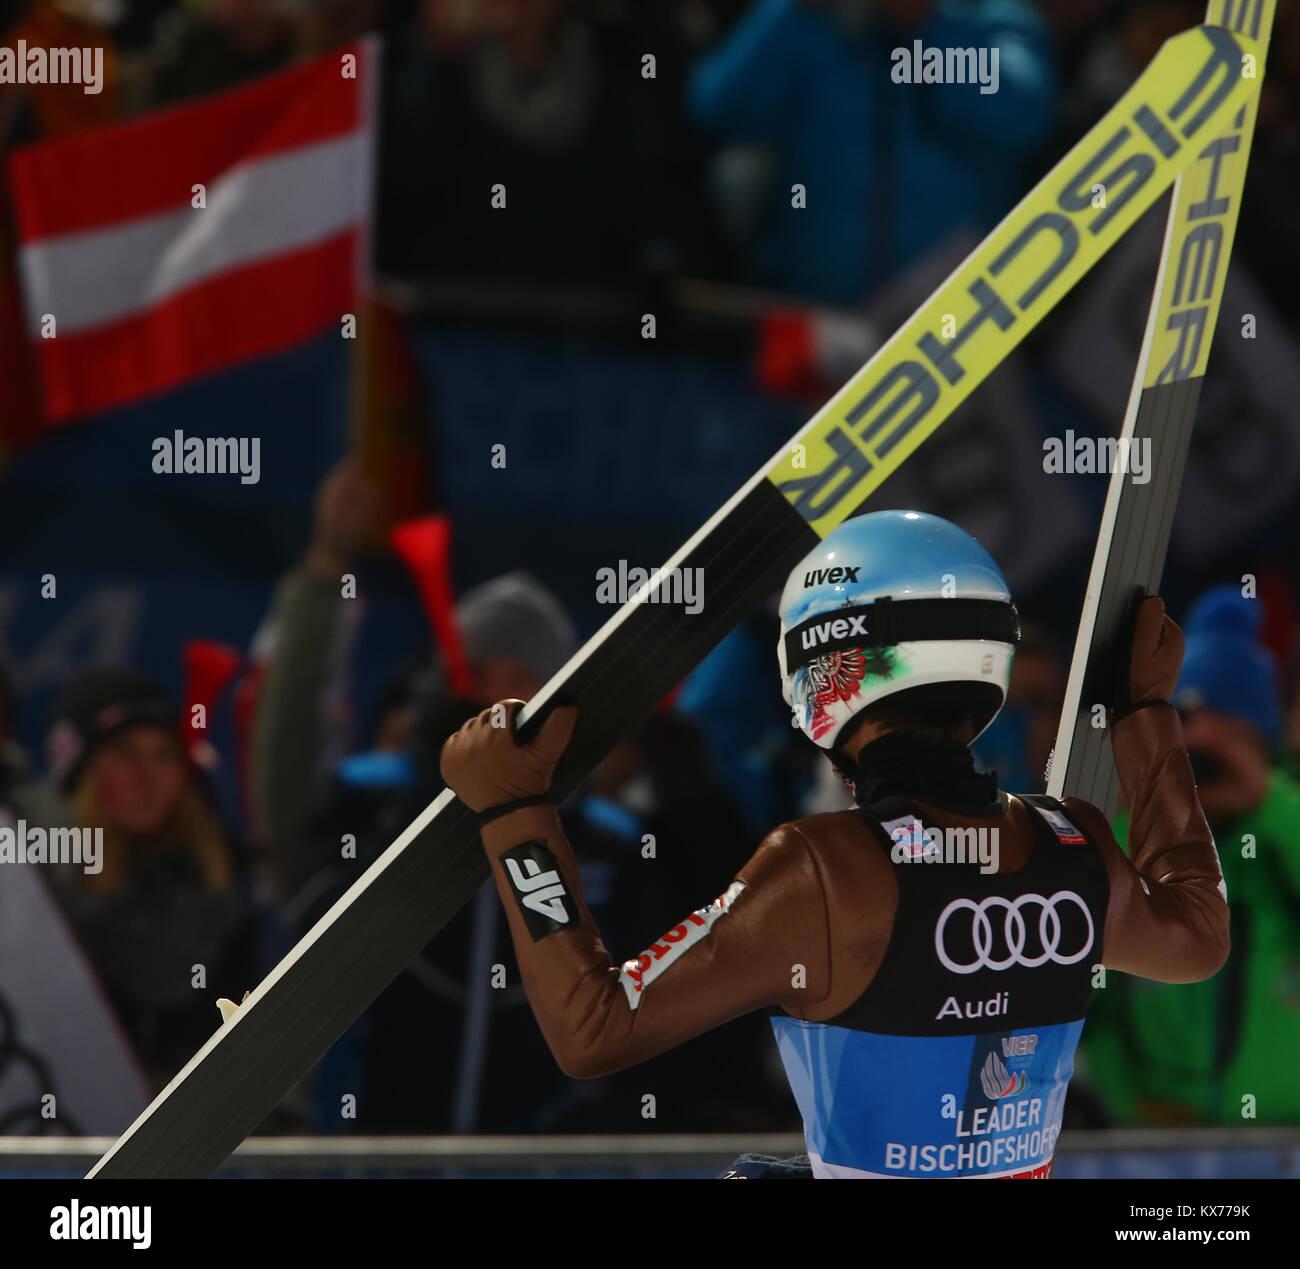 Ski Jumping Stadium Stock Photos & Ski Jumping Stadium Stock Images - Alamy